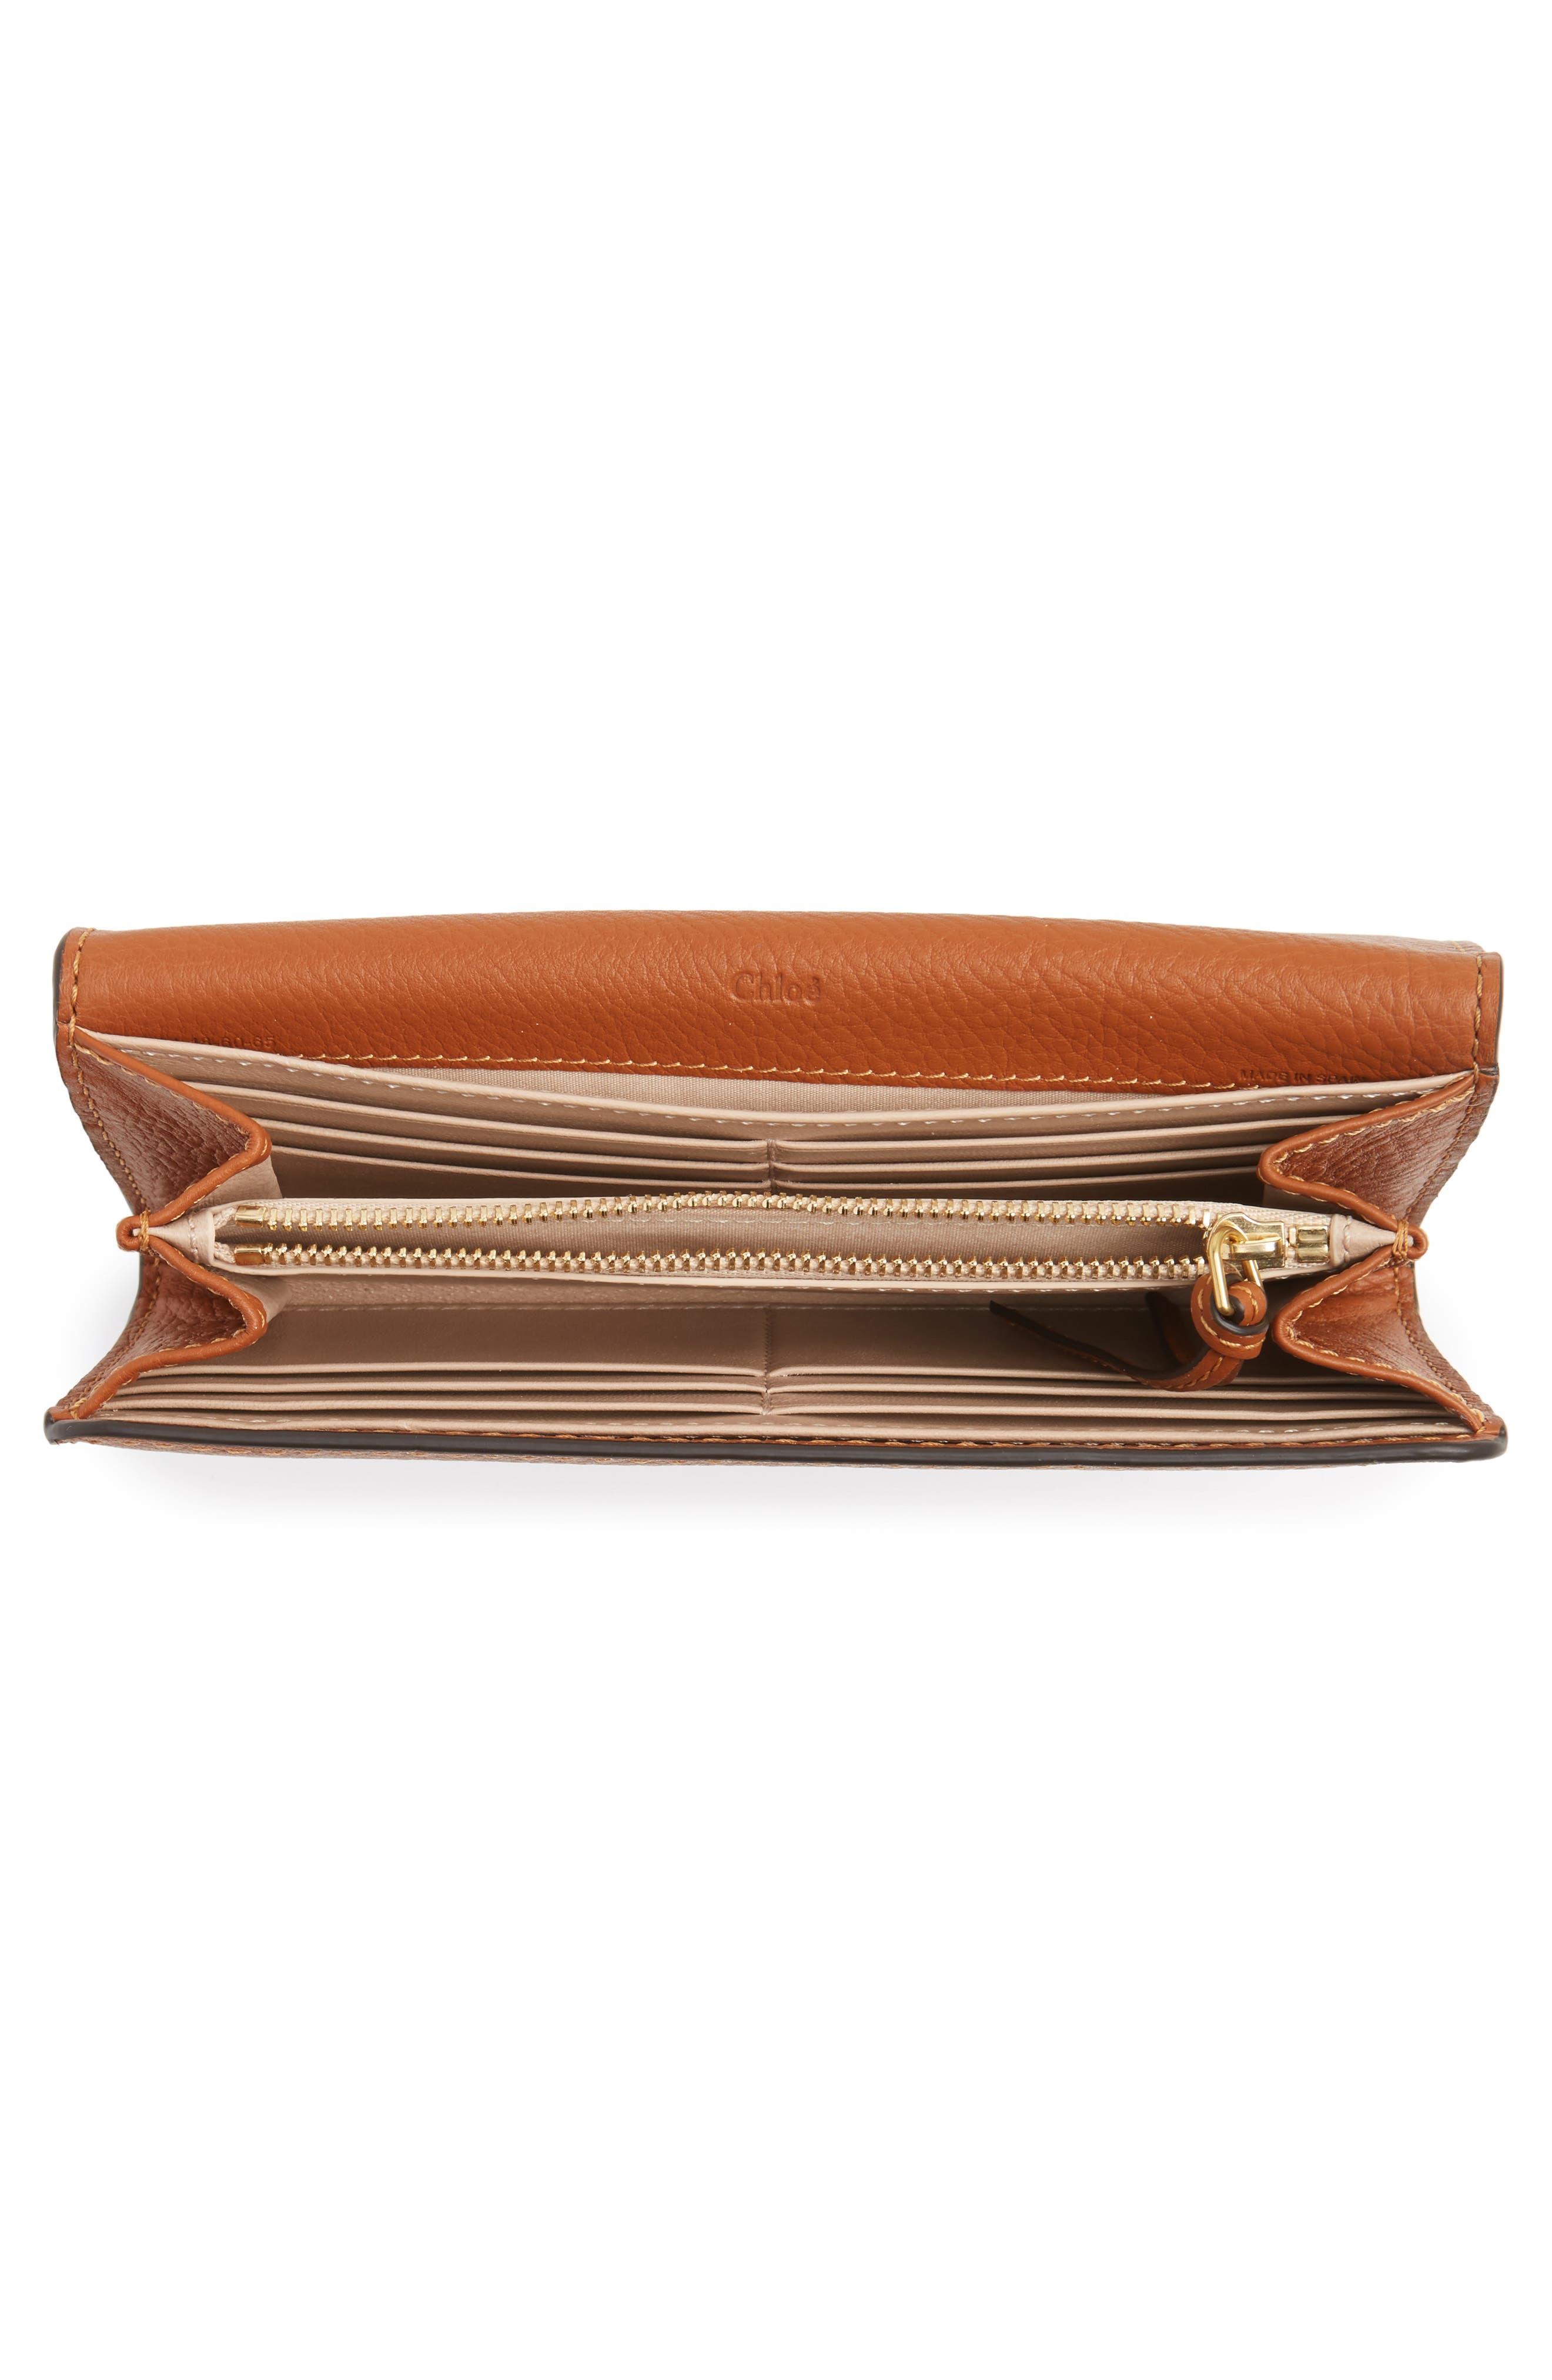 Blue Wallets & Card Cases for Women | Nordstrom